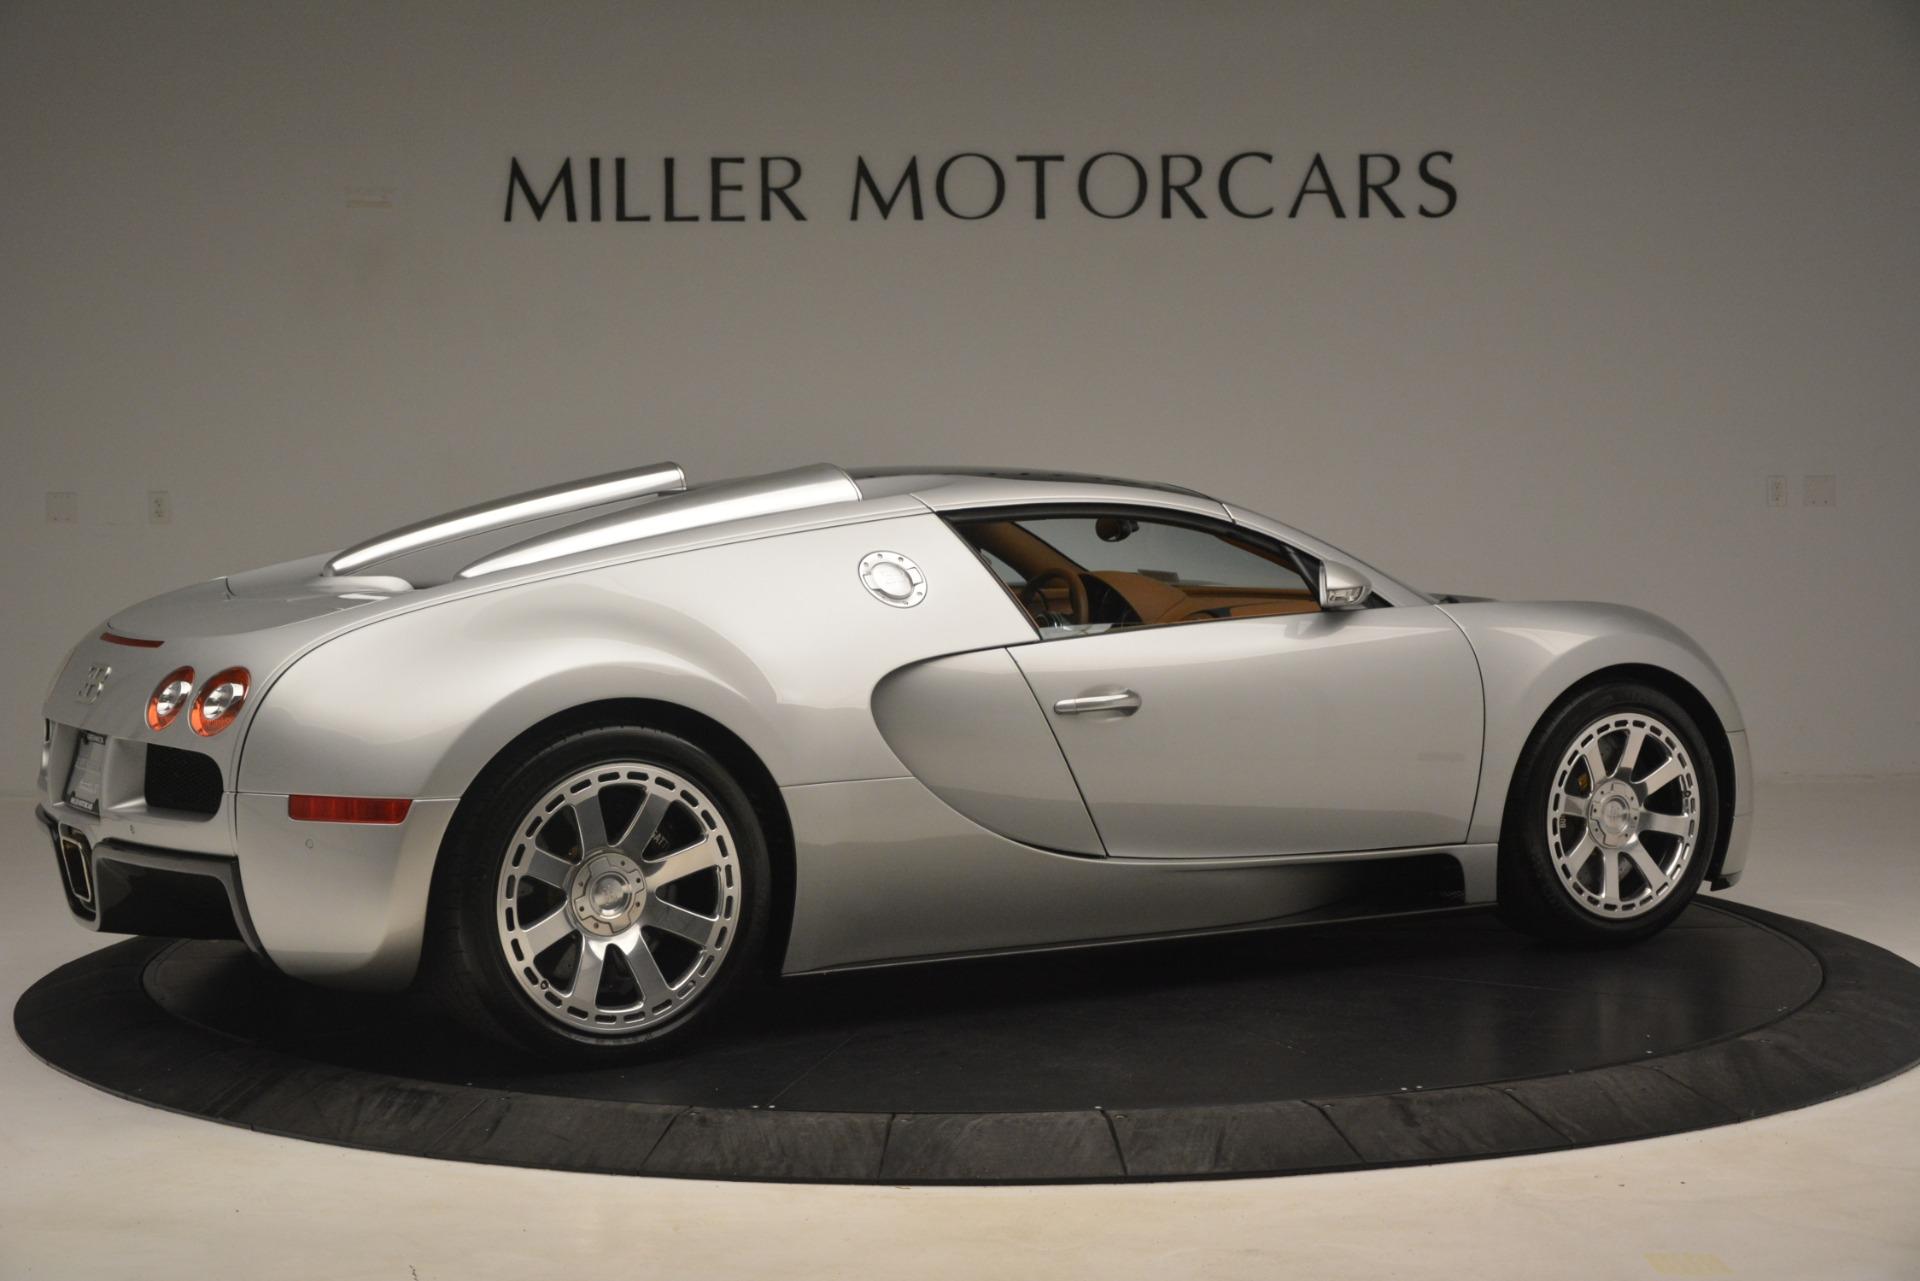 Used 2010 Bugatti Veyron 16.4 Grand Sport For Sale In Greenwich, CT 3159_p18